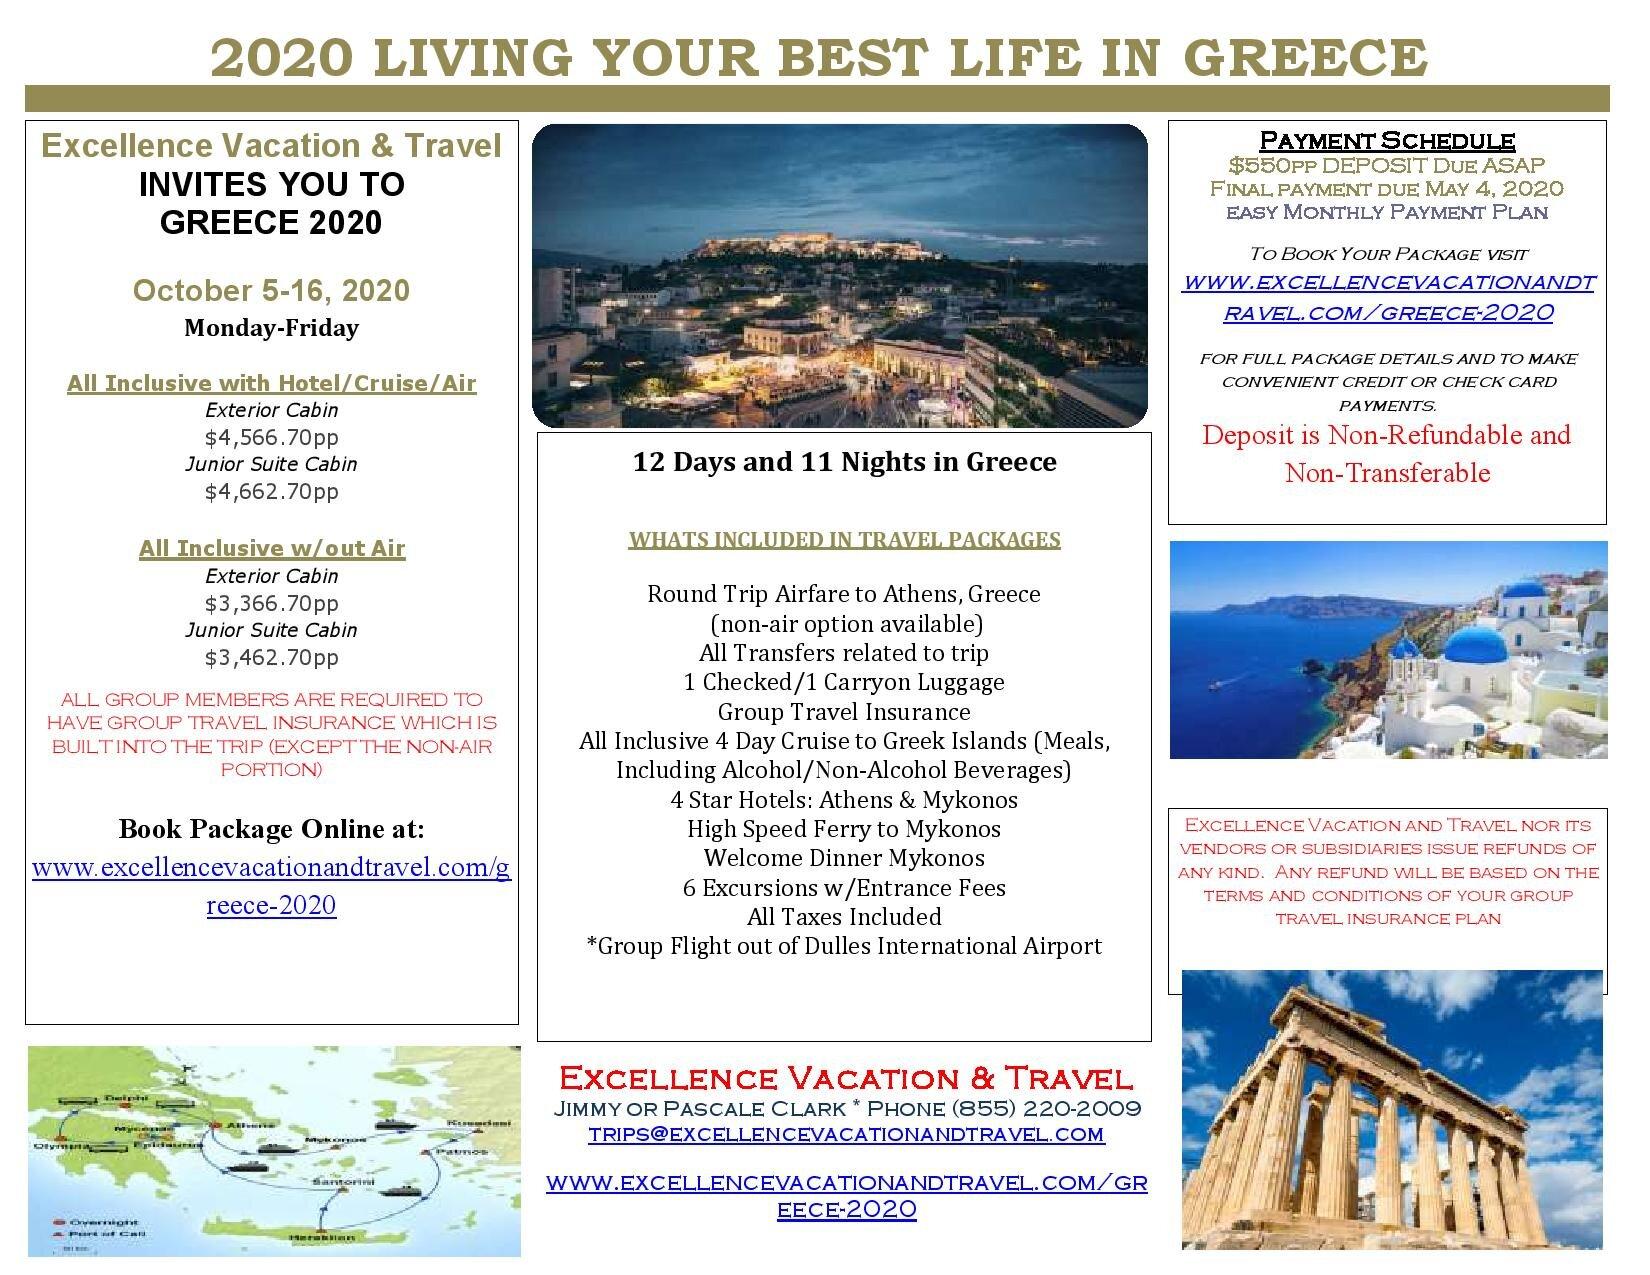 Greece2020Flyer-page-001.jpg